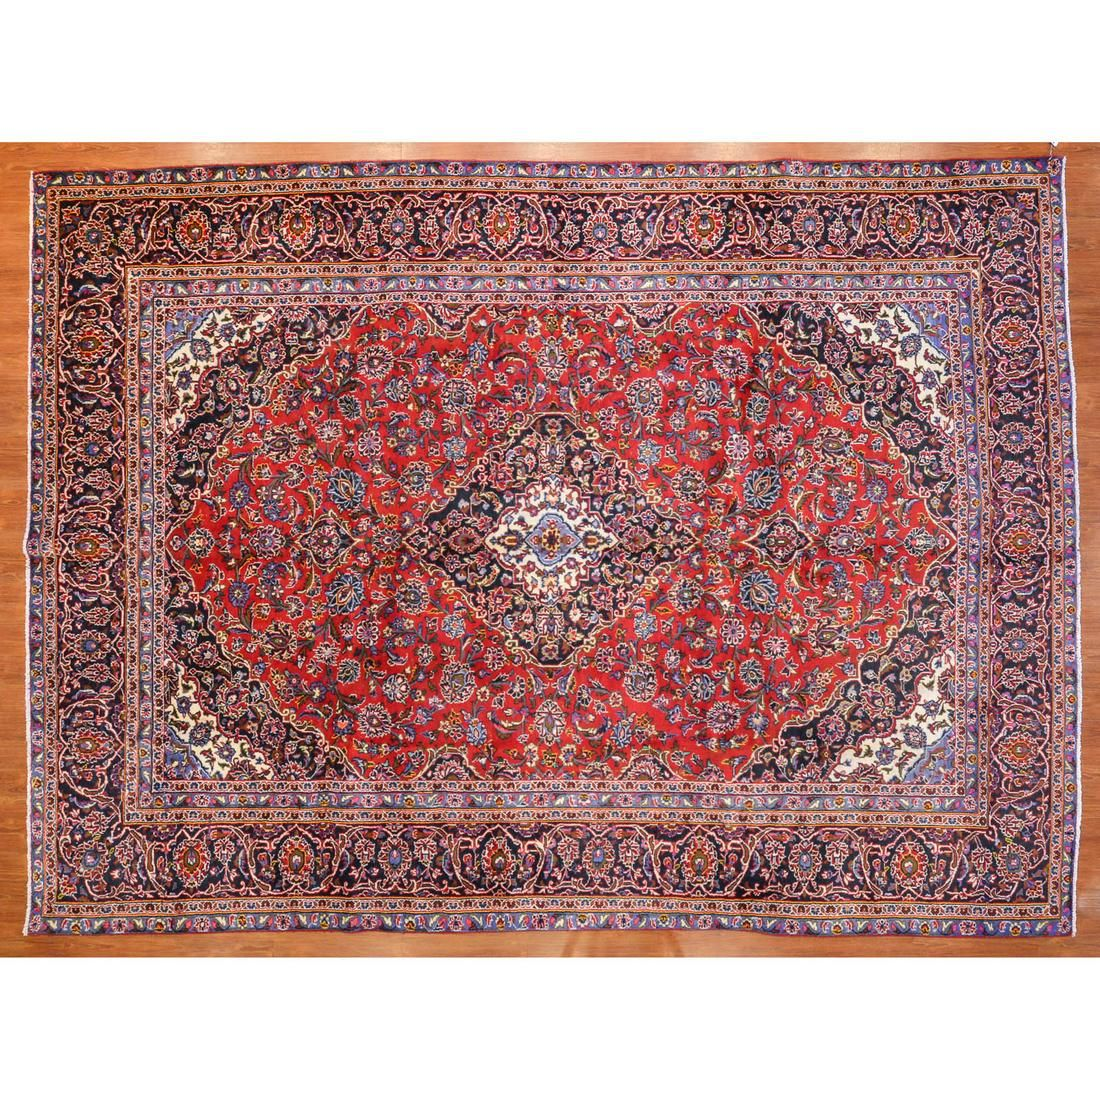 Kashan Carpet, Persia, 9.2 x 12.6